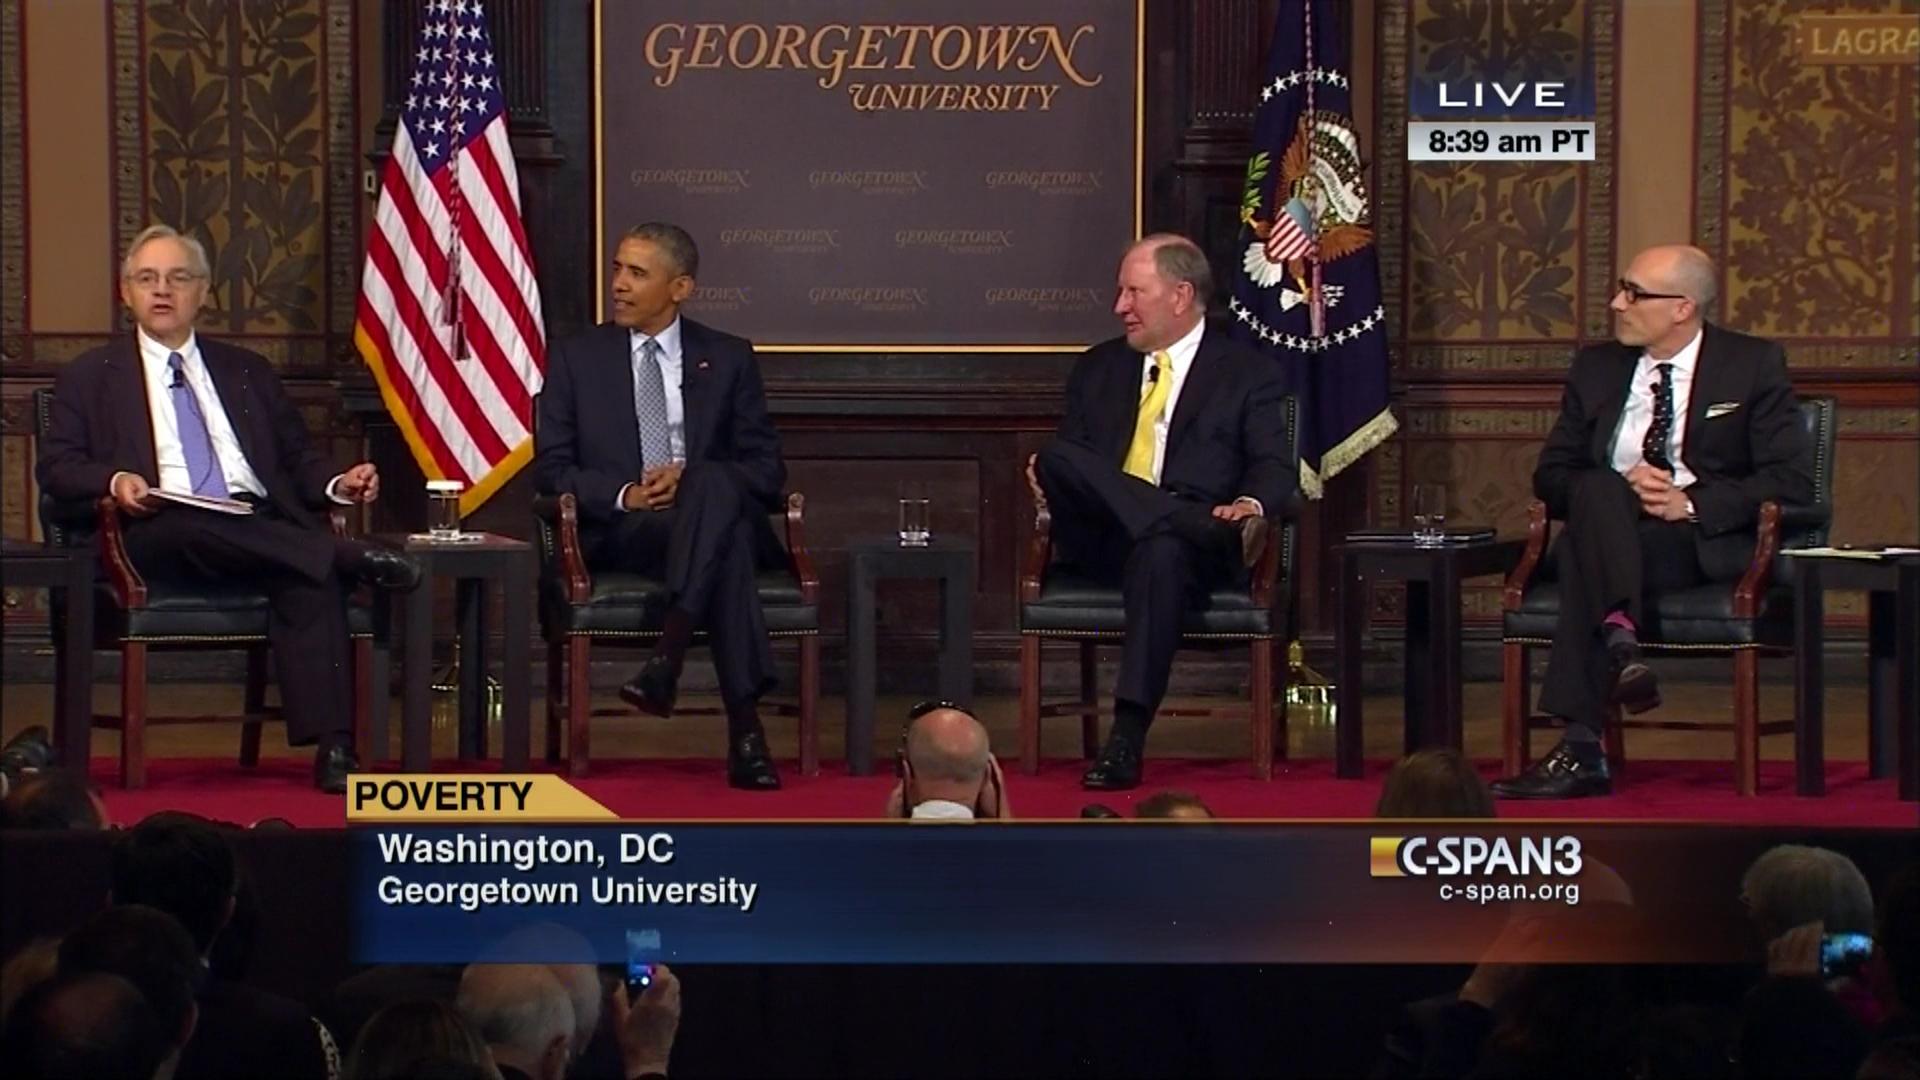 Robert Putnam When Did Poor Kids Stop >> President Obama Remarks On Poverty